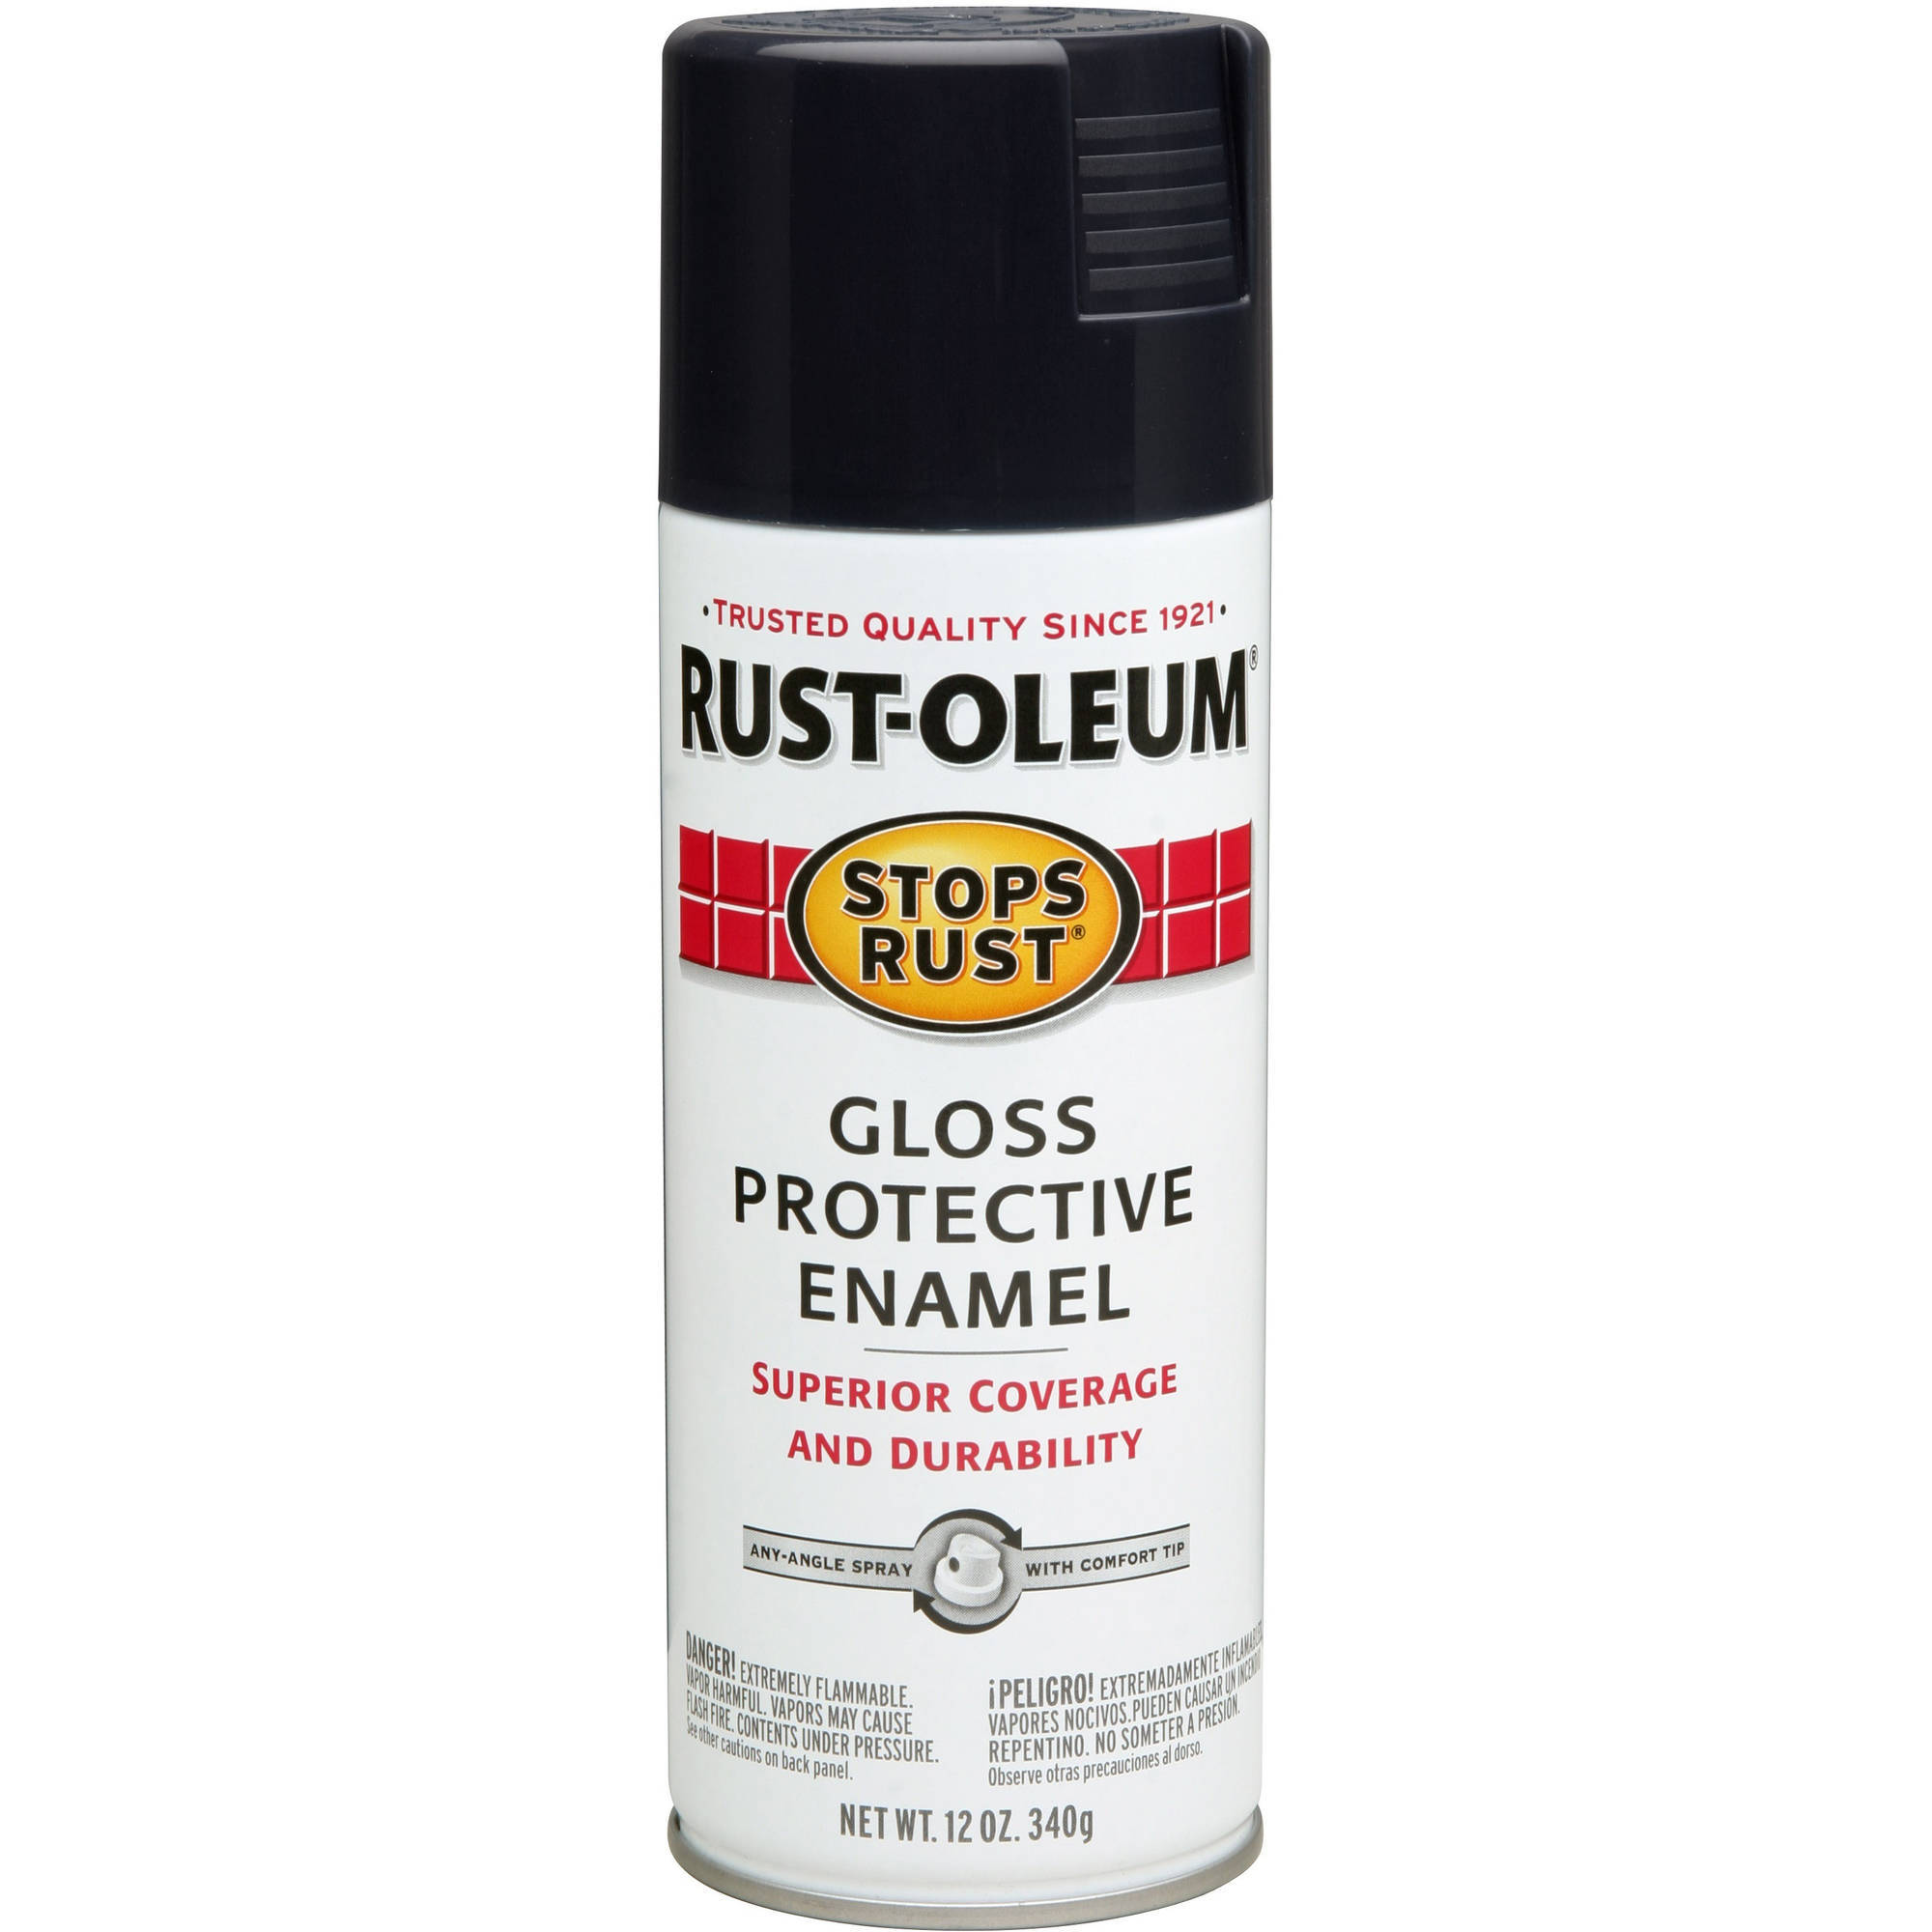 Rust-Oleum Stops Rust Gloss Protective Enamel